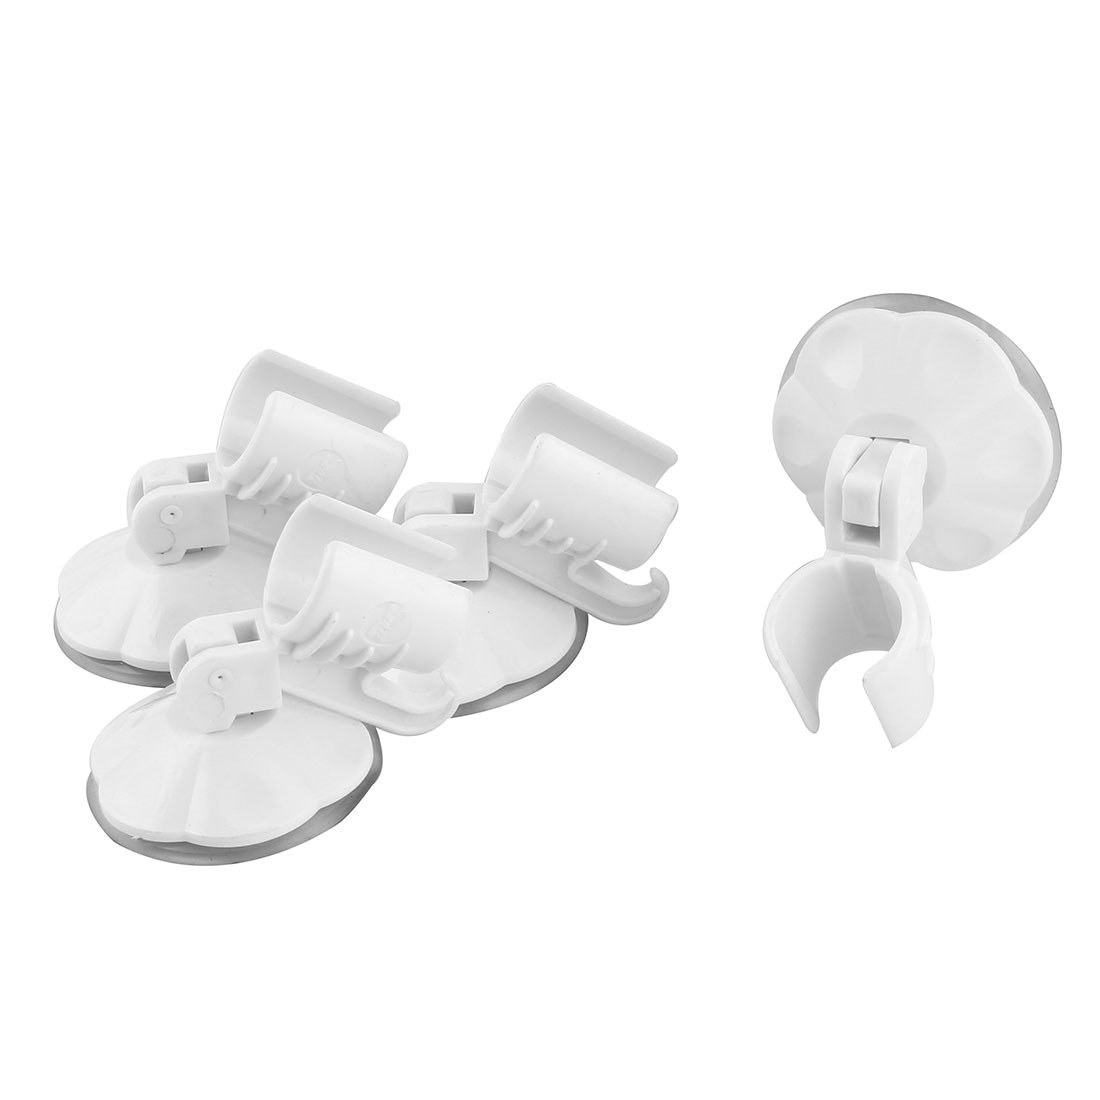 Apartment Plastic Sucker Wall Mounted Adjustable Shower Head Holder White 4pcs